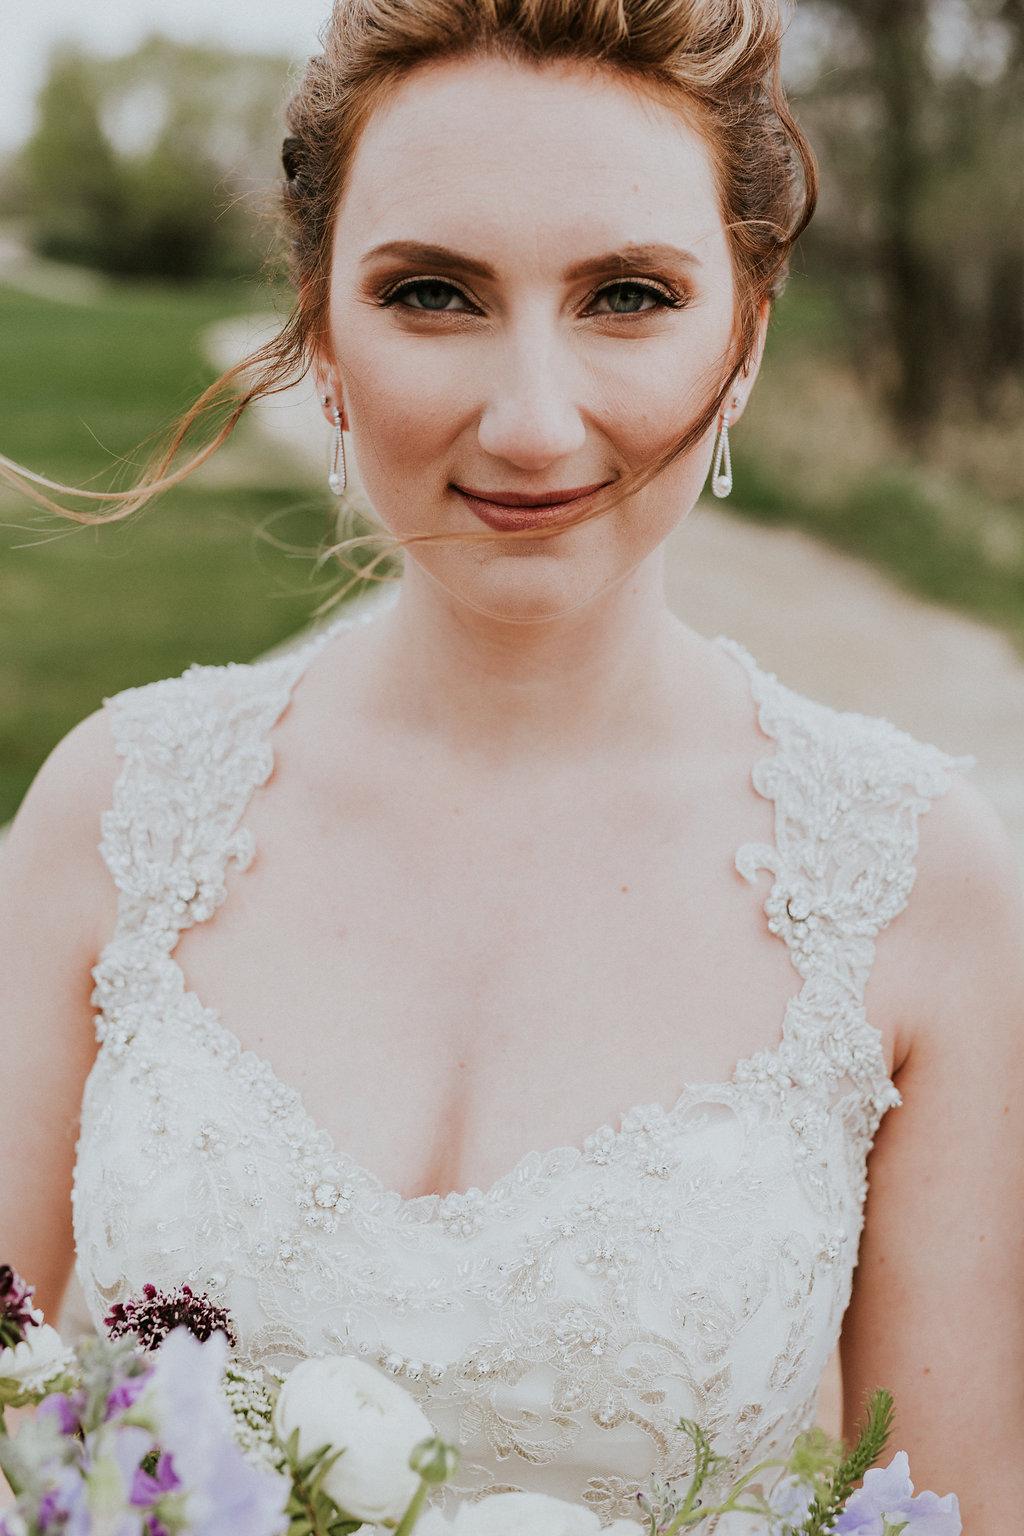 Wedding Photographer in Winnipeg - Wedding Planning in Winnipeg